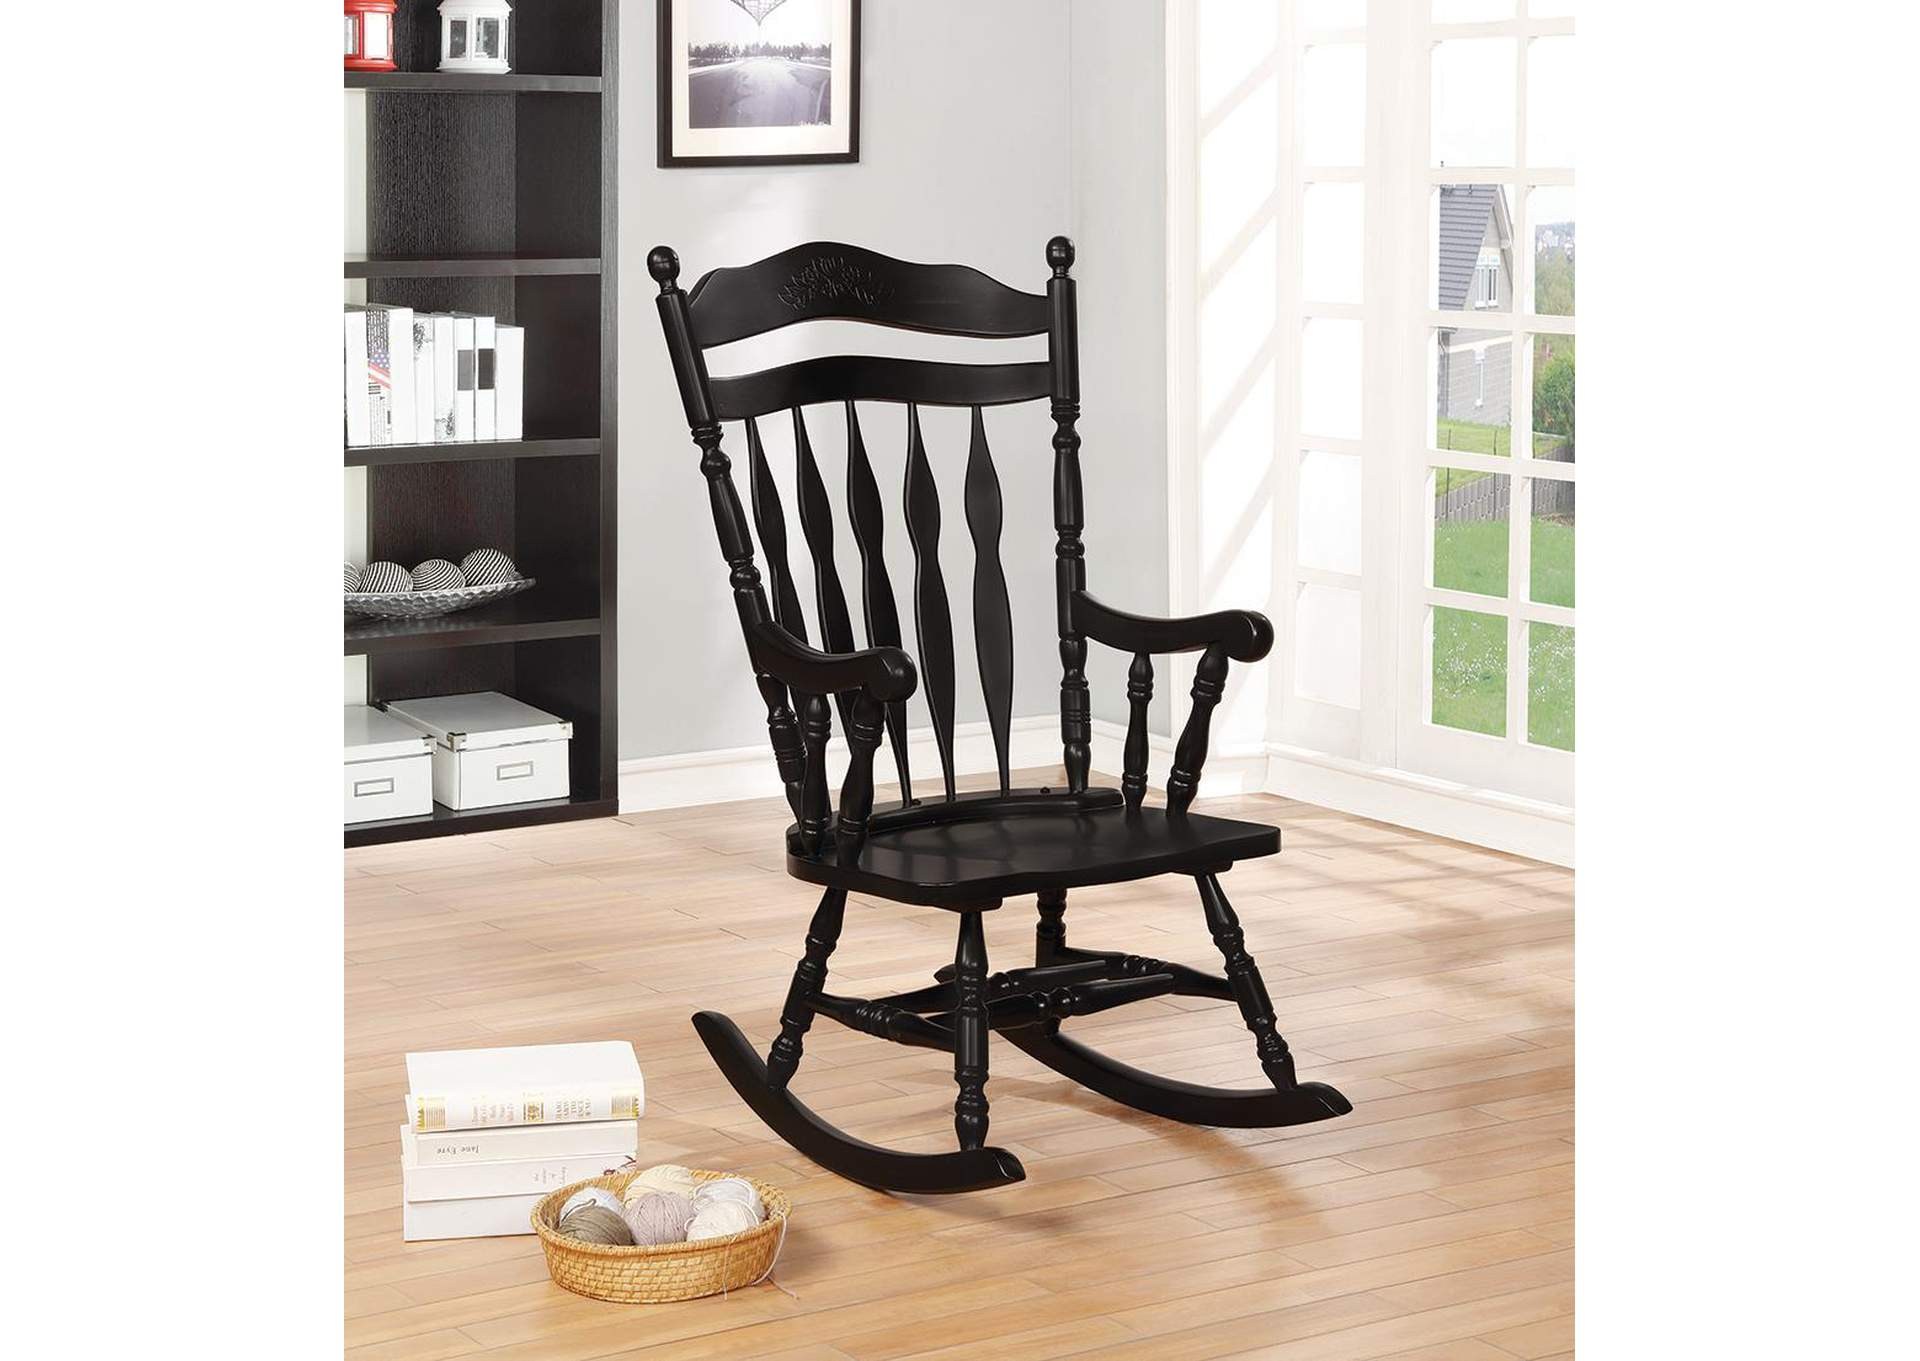 Swell Brothers Fine Furniture Windsor Black Rocking Chair Machost Co Dining Chair Design Ideas Machostcouk